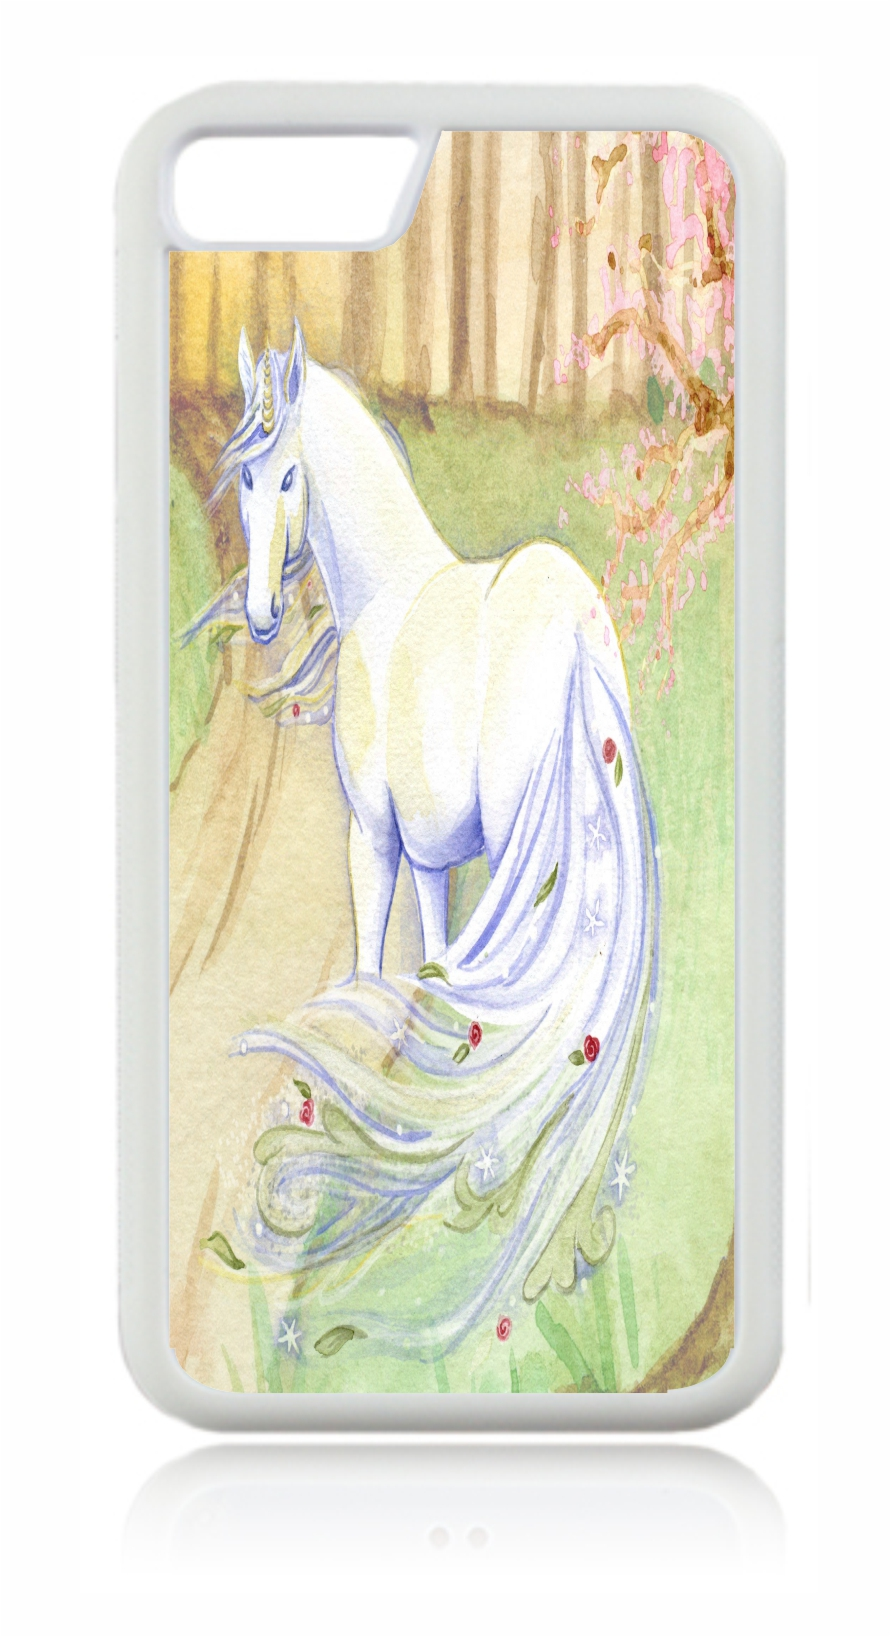 Unicorn Painting iPhone 6/6S Plus Case